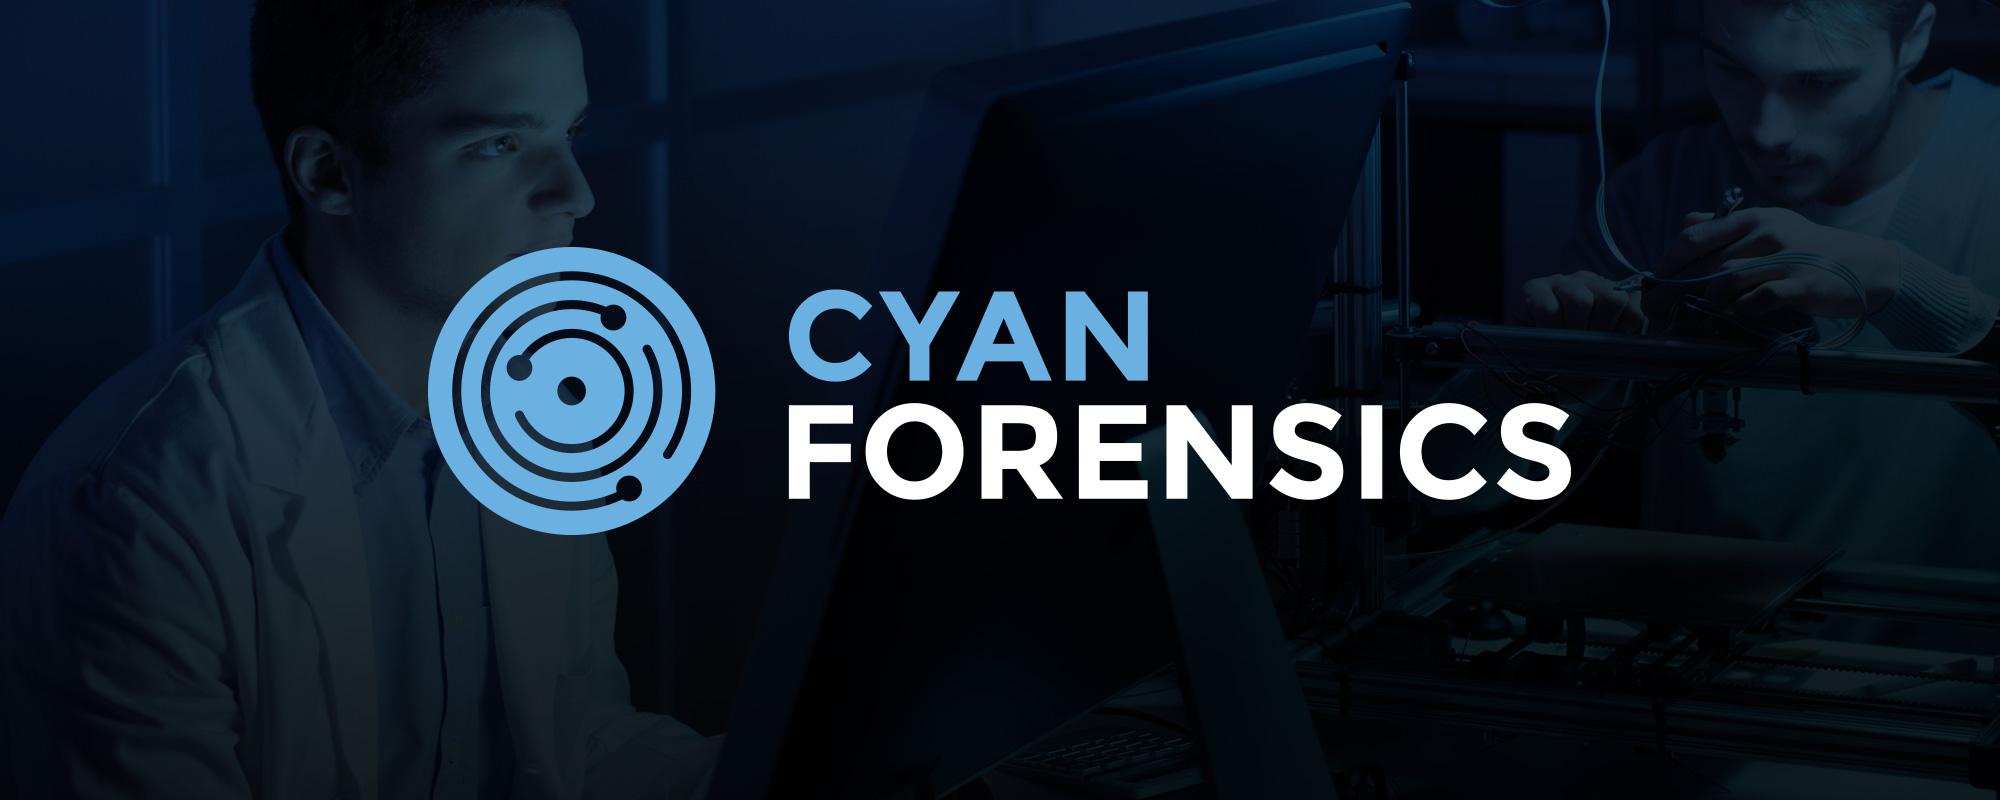 Cyan-Forensics-banner.jpg